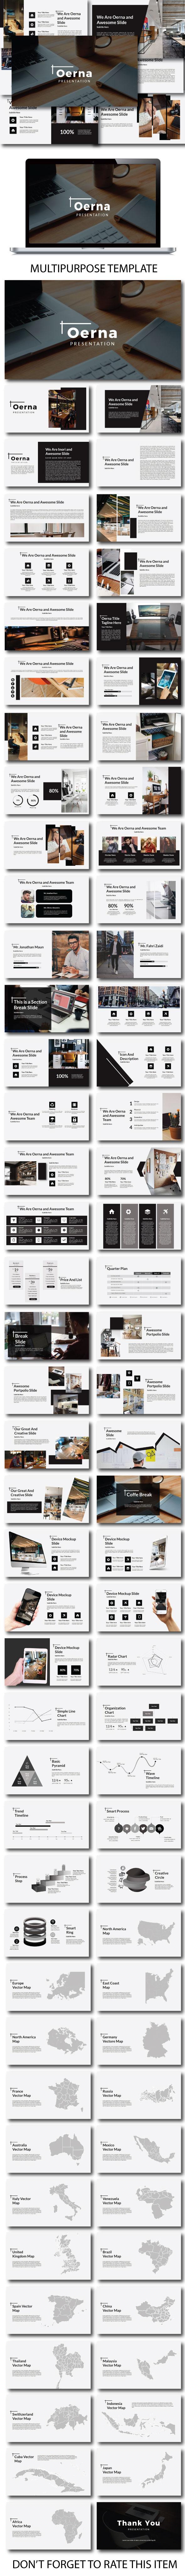 Oerna Multipurpose Powerpoint Template - PowerPoint Templates Presentation Templates